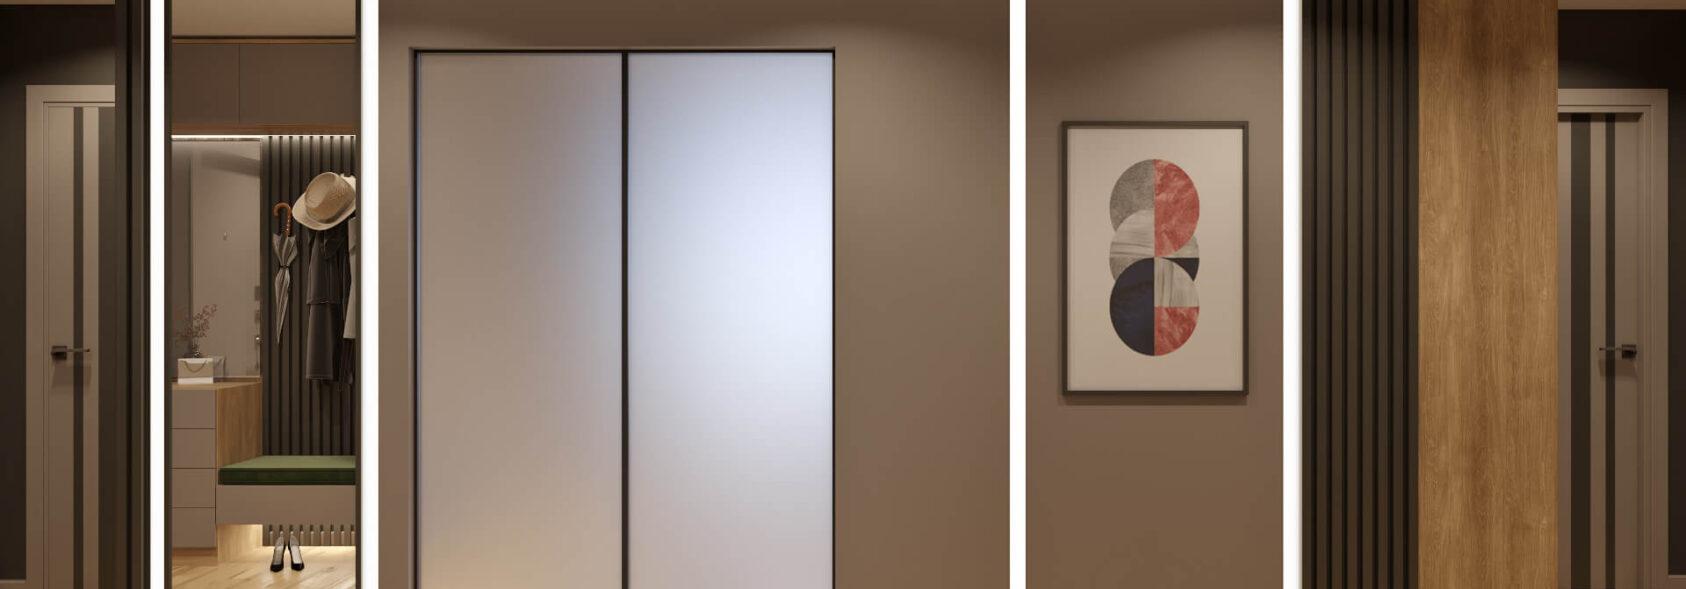 Прихожая дизайн 3х комнатной квартиры Днепр